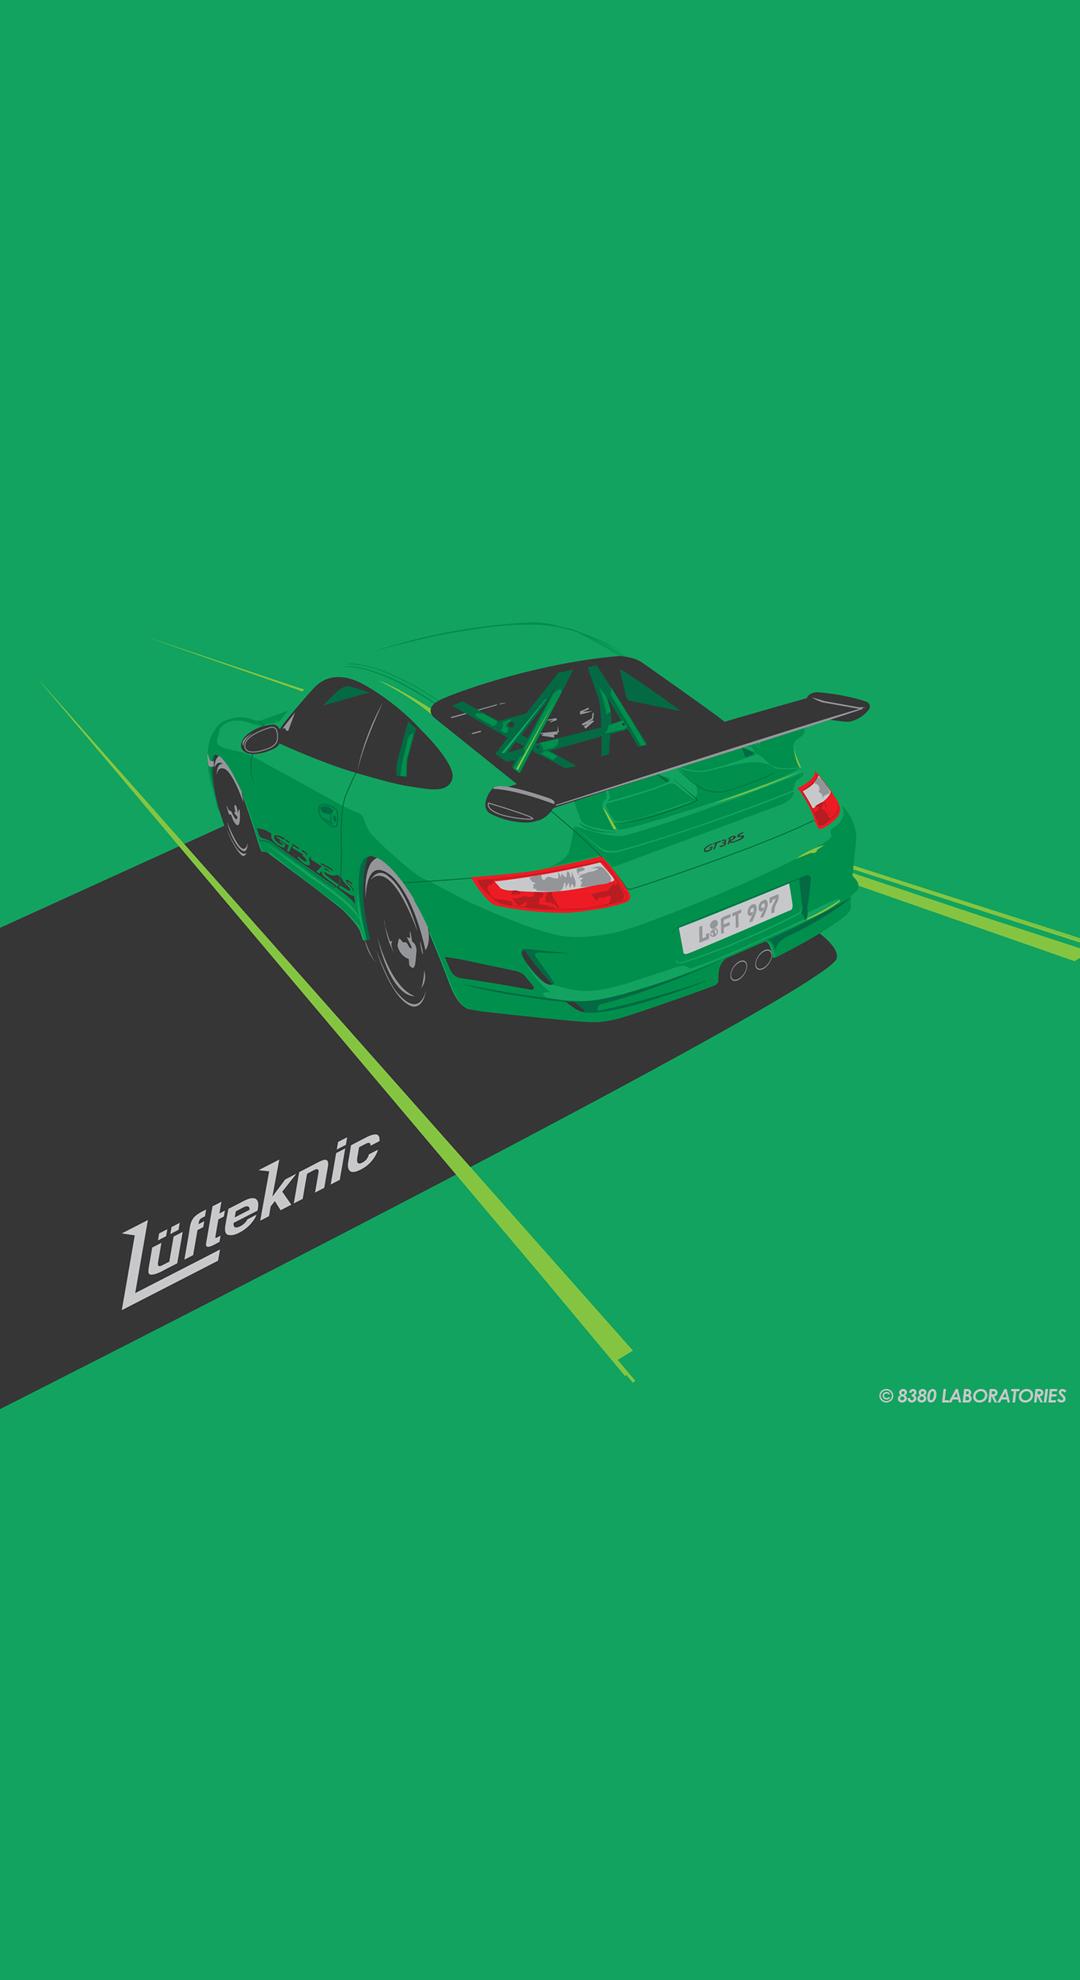 Wallpaper Downloads Lufteknic Porsche Parts Service And